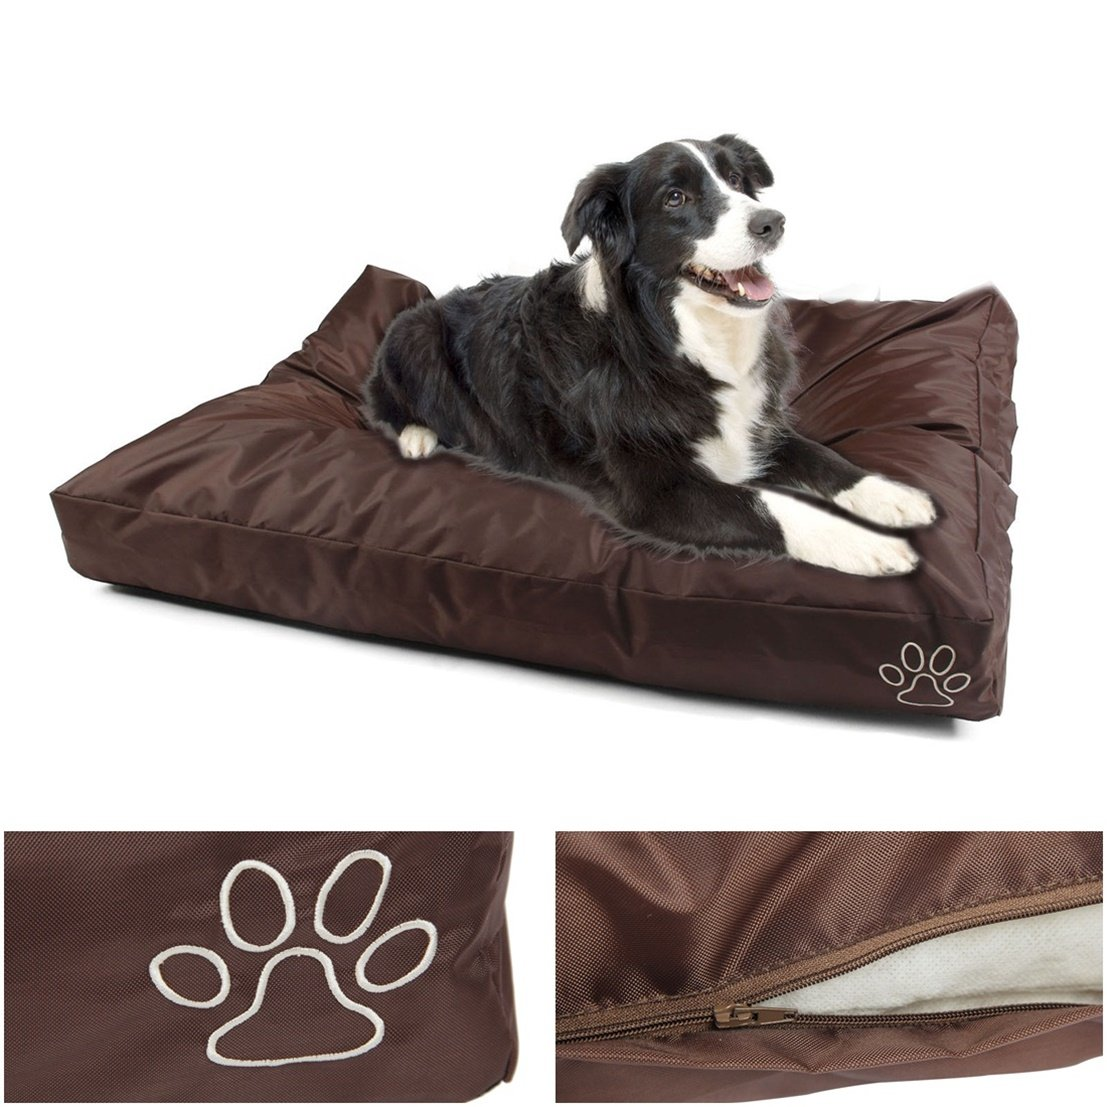 1Pcs Transcendental Popular Pet Bed Cover Size XL 48'' x 29'' Soft Zipper Cat Pillow Color Type Brown Oxford